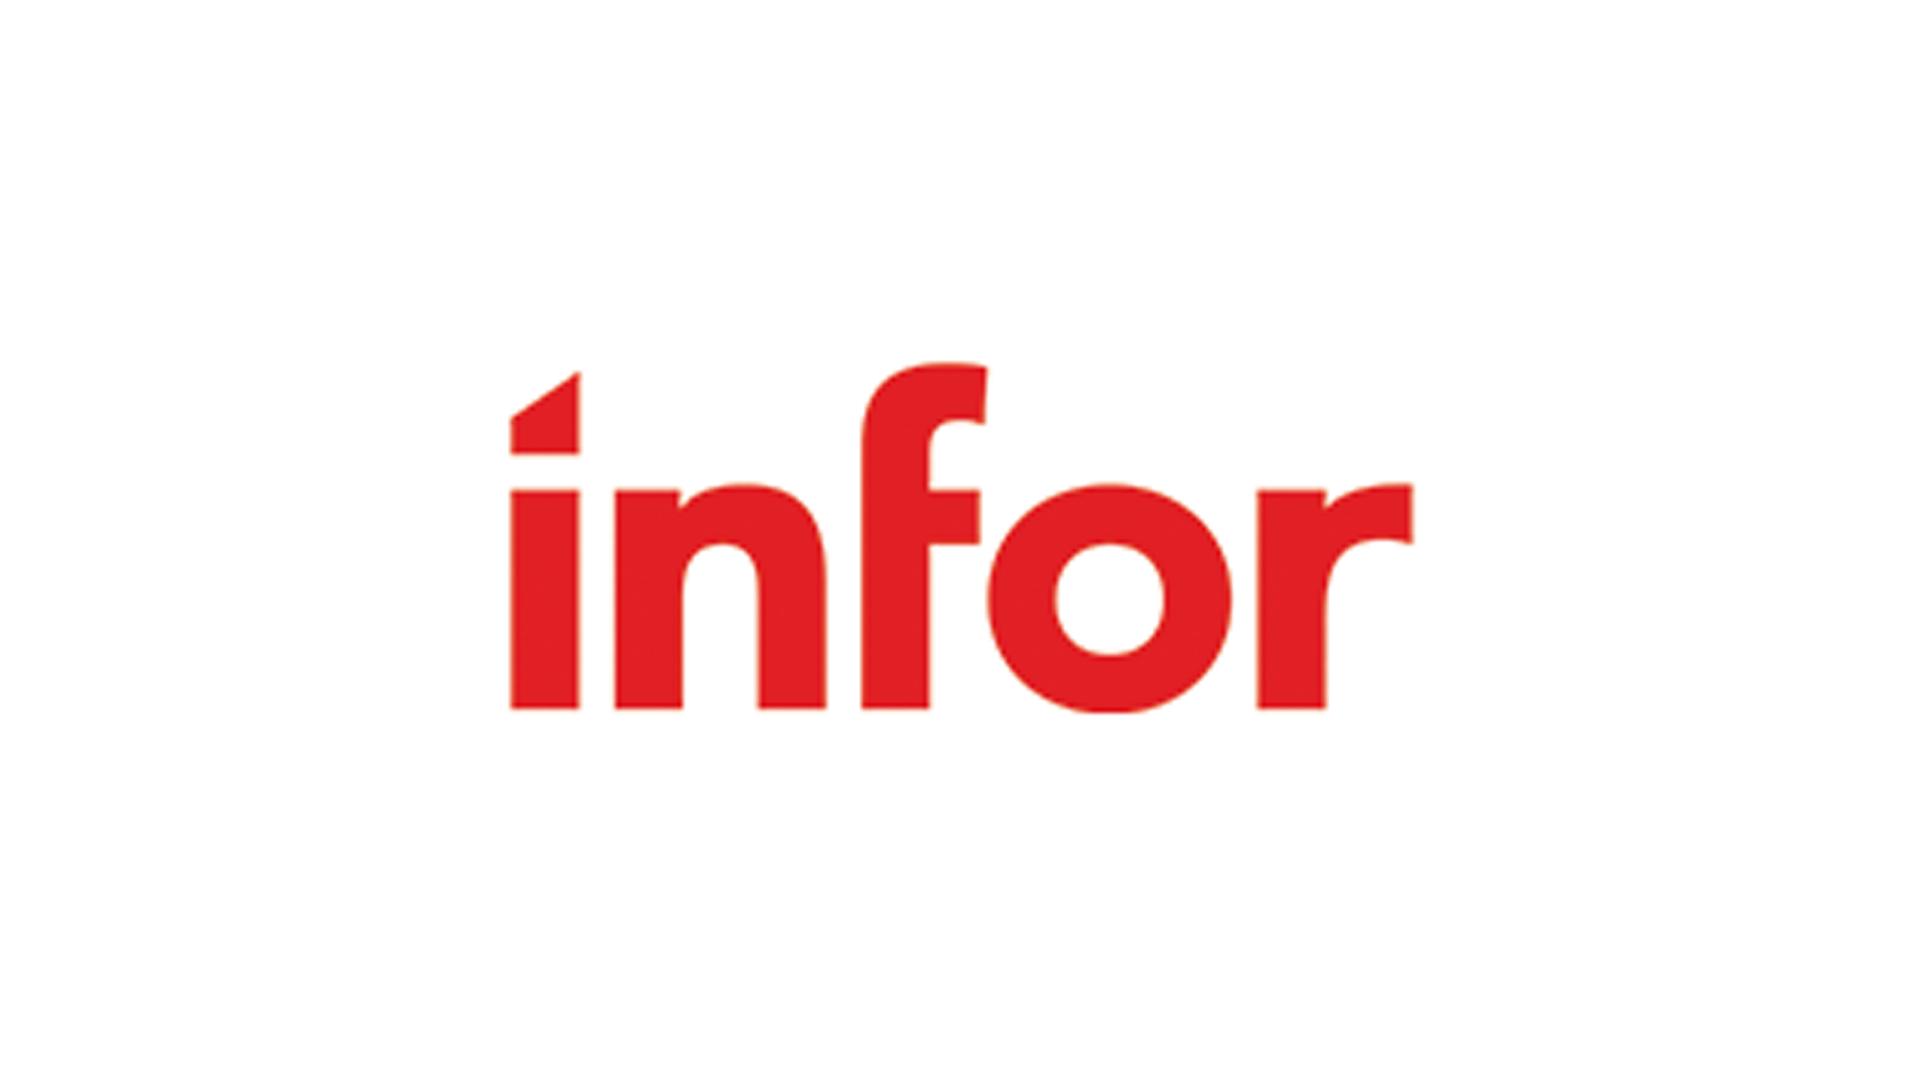 Infor HMS logo